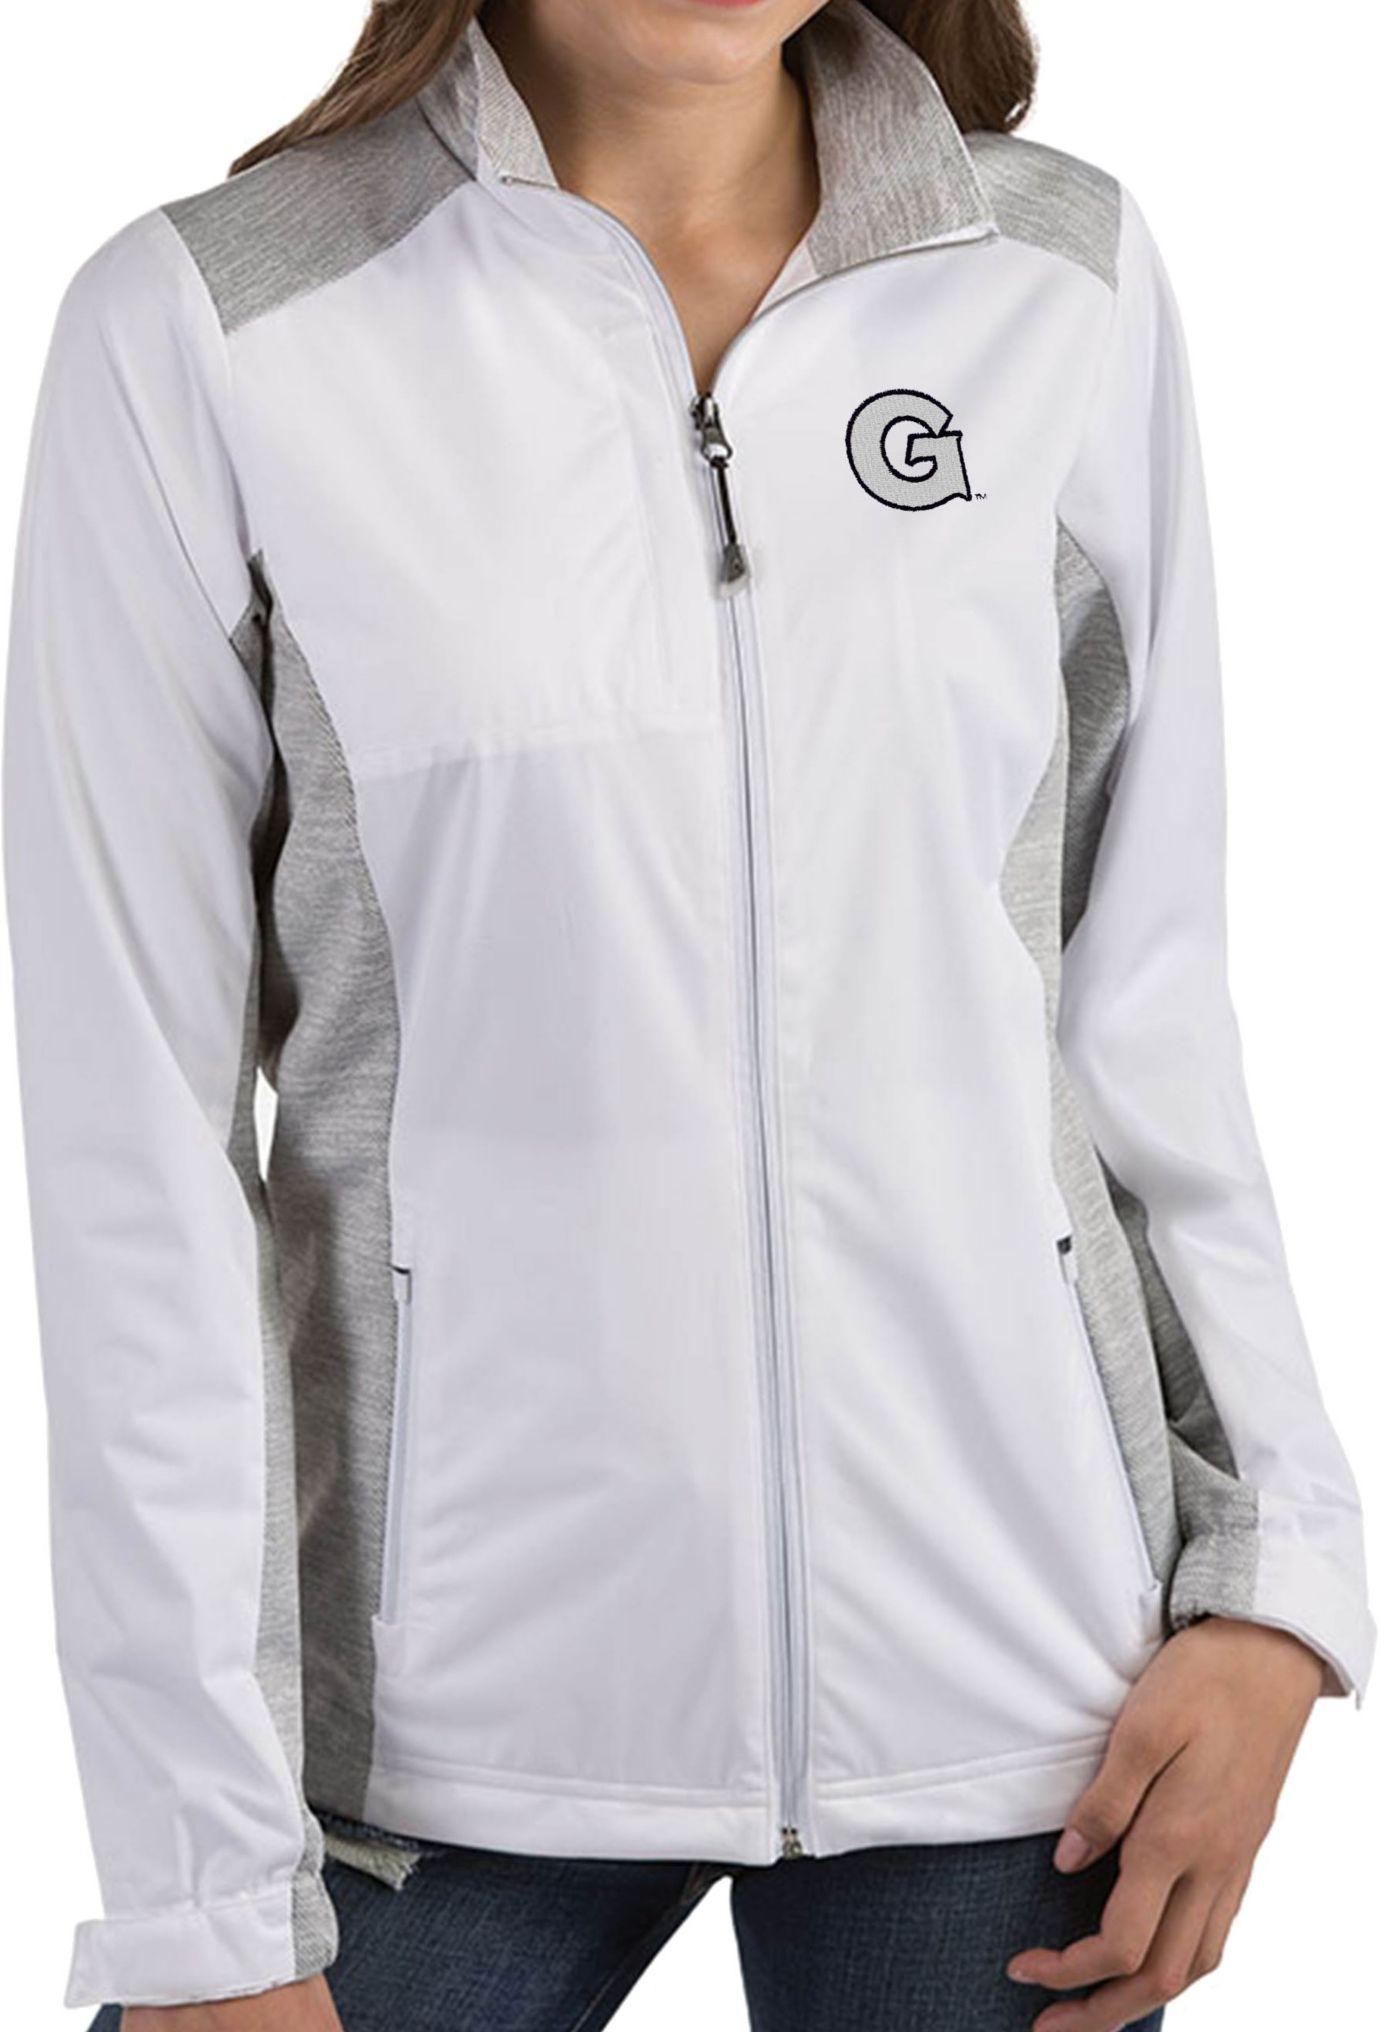 Antigua Women's Georgetown Hoyas Revolve Full-Zip White Jacket